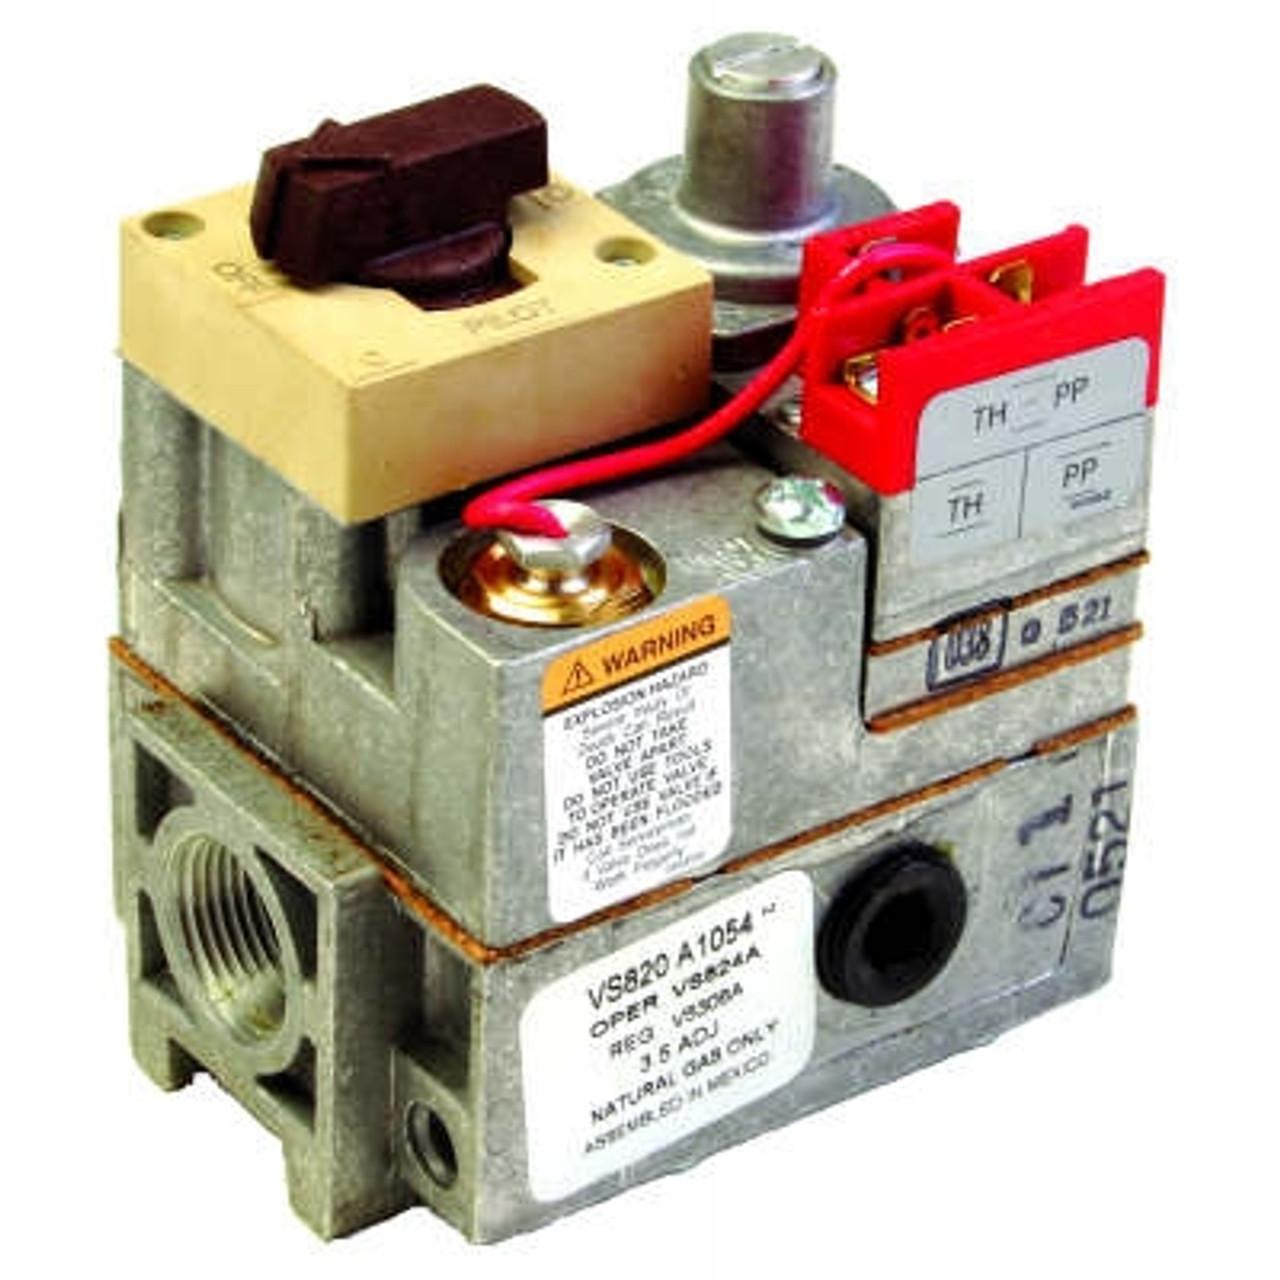 millivolt gas valve wiring diagram honeywell vs820m1309 u universal millivolt gas valve  u universal millivolt gas valve